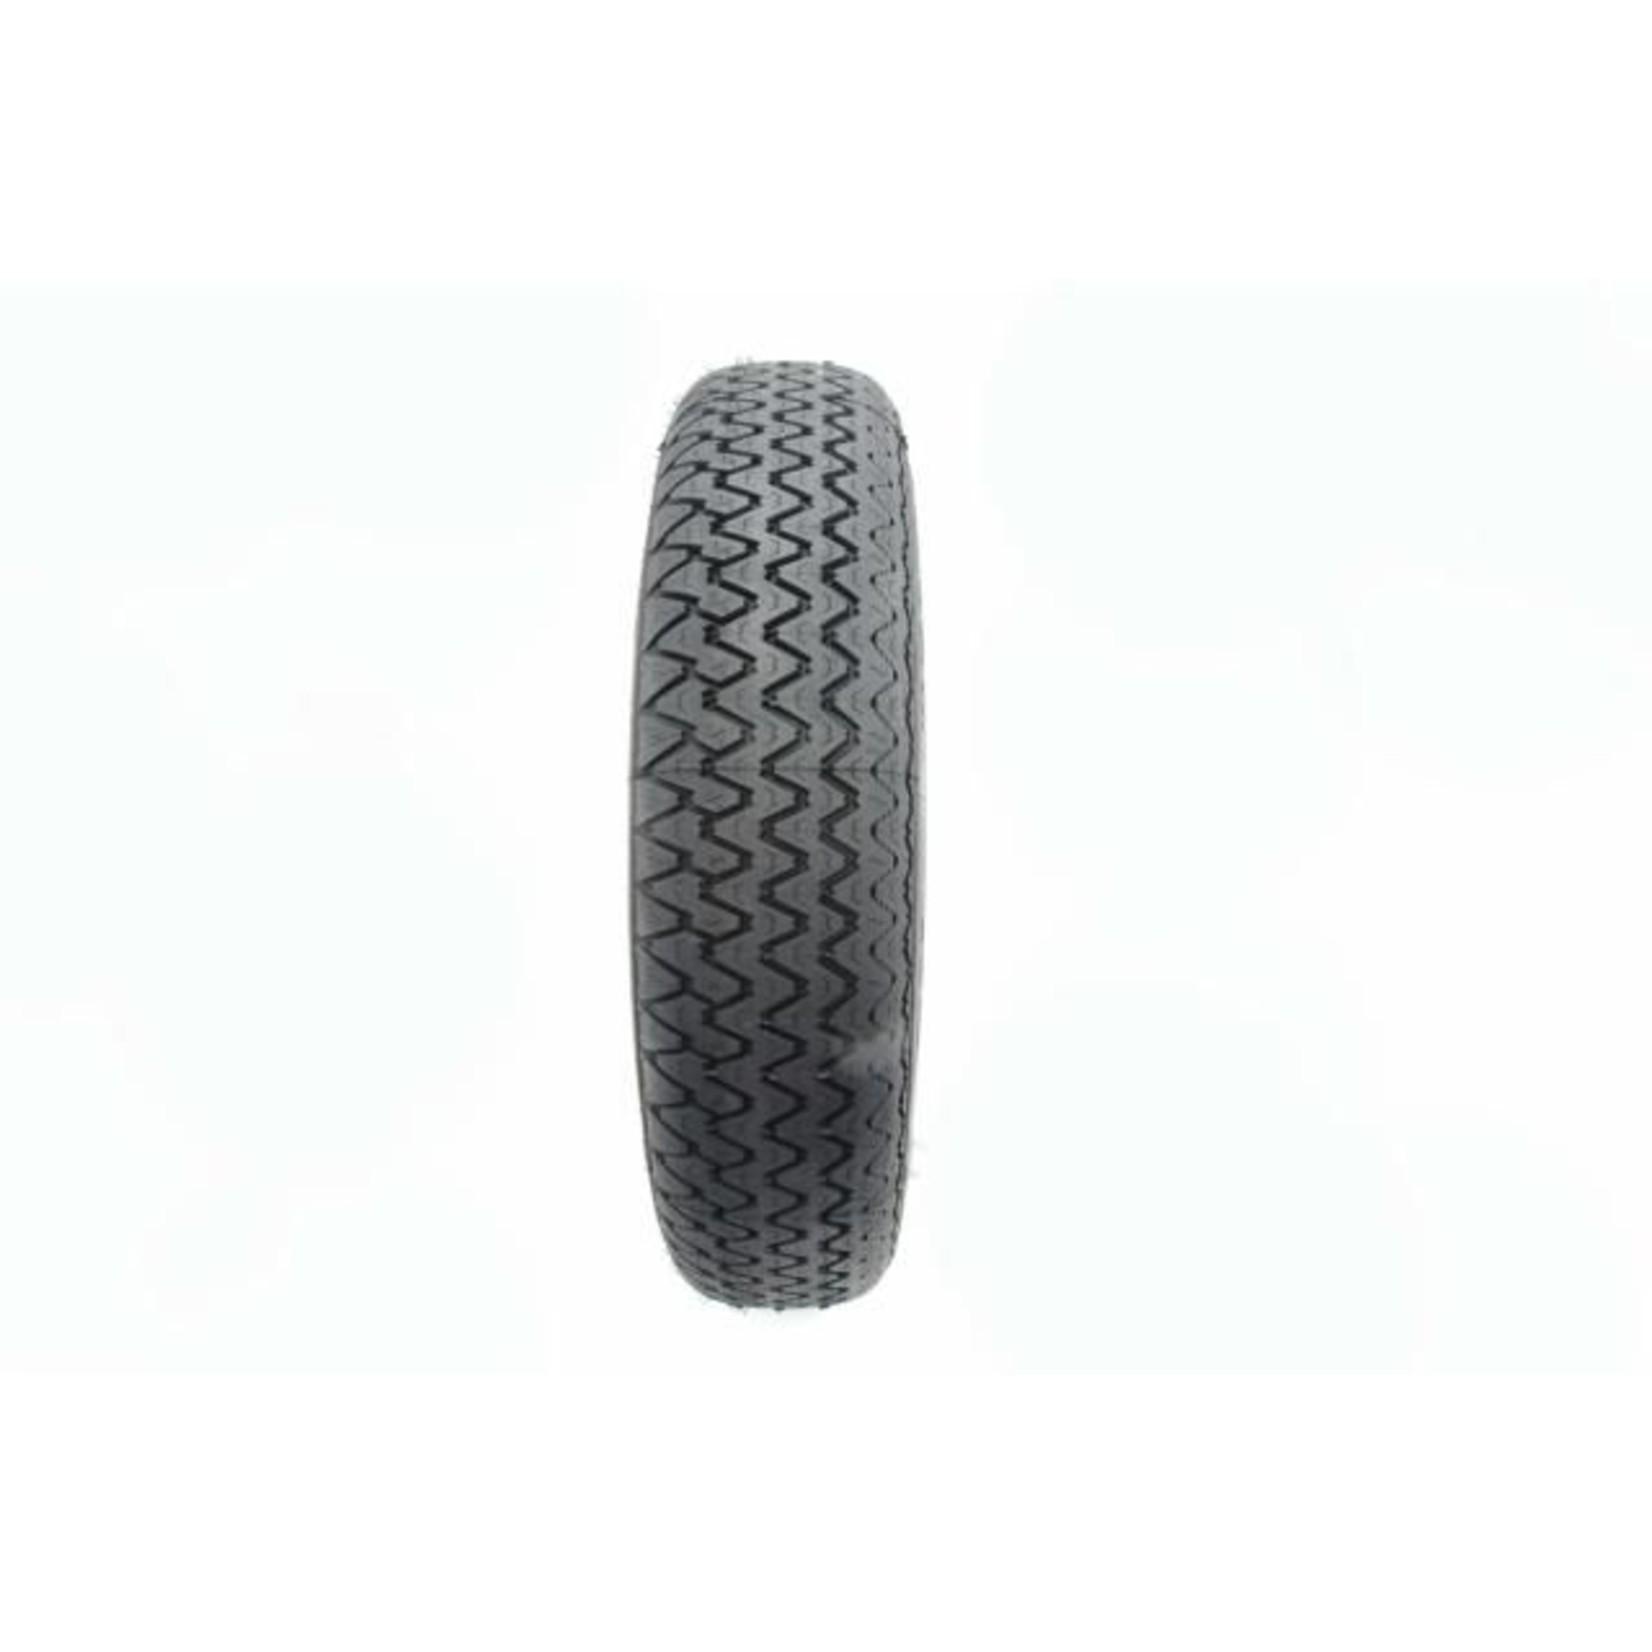 Pneumatique 185HR15 XVS-P Michelin